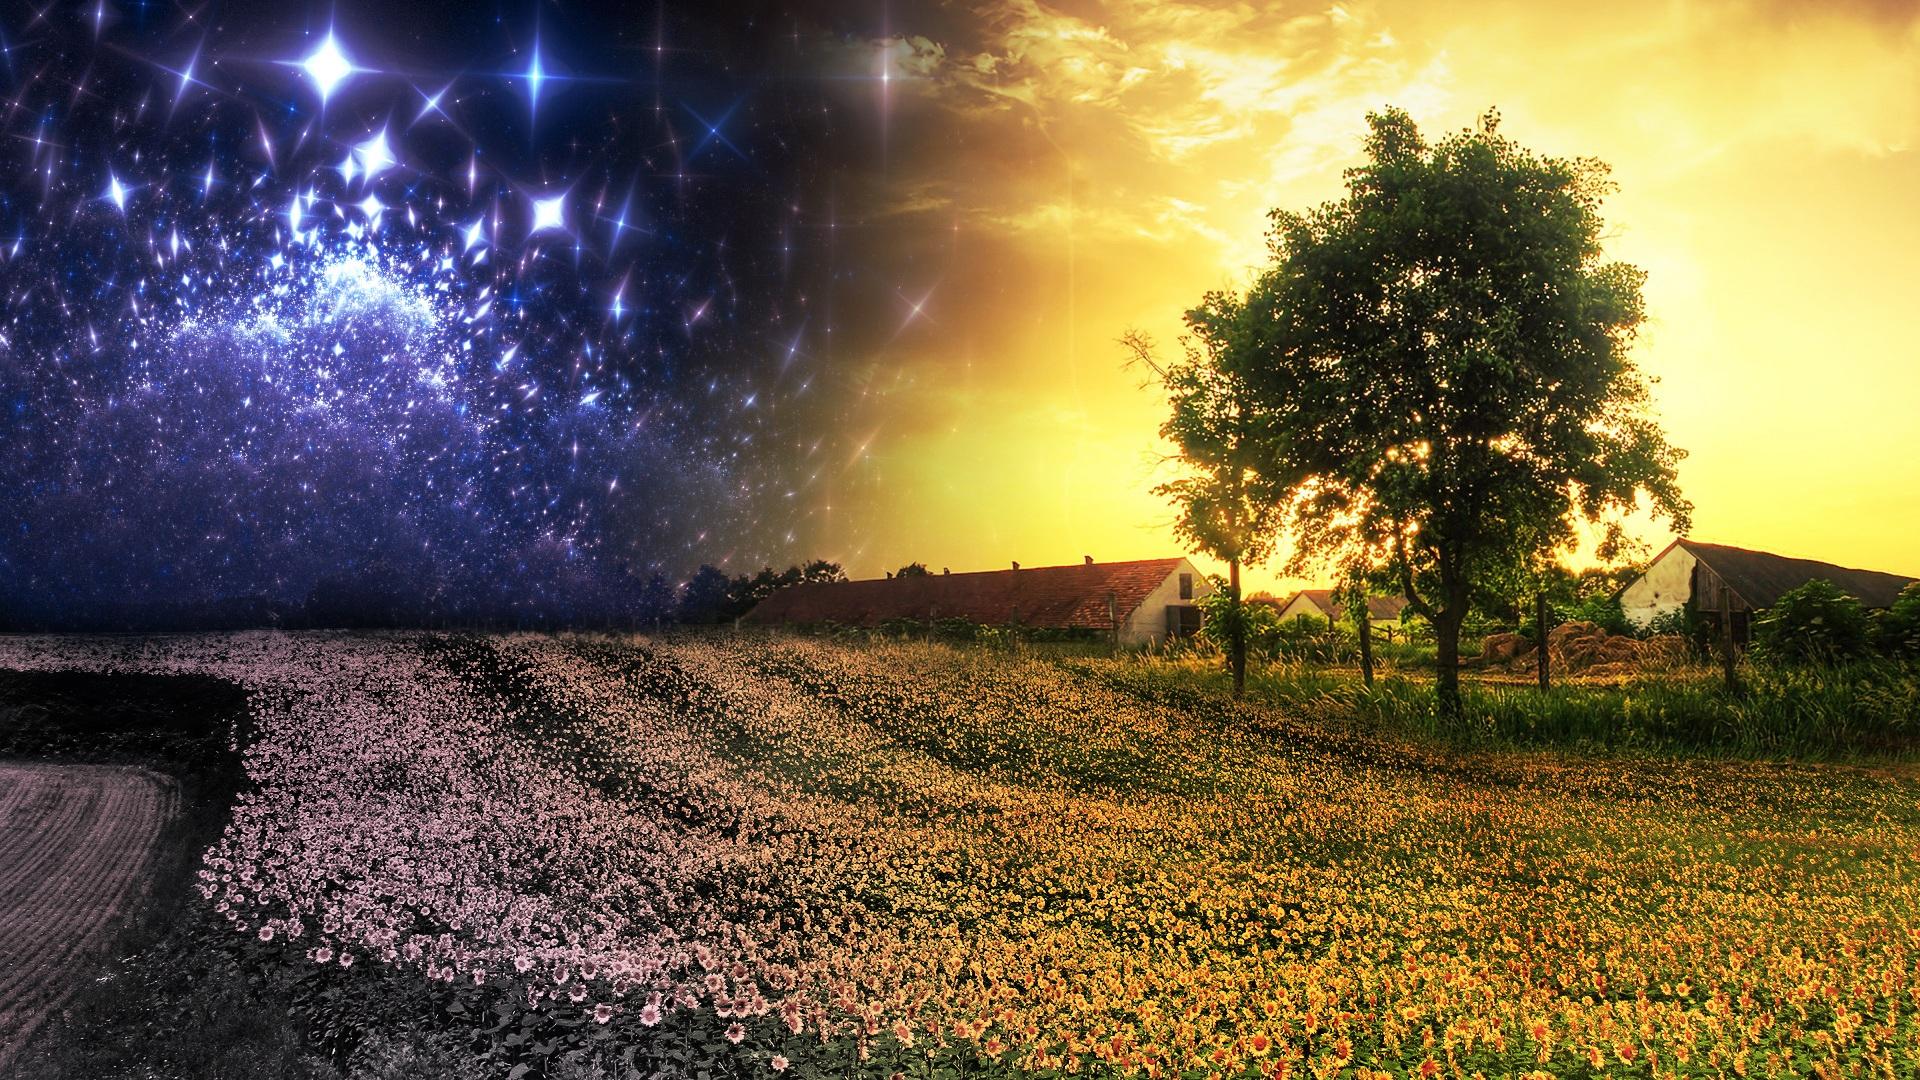 звезды утро картинки минусы